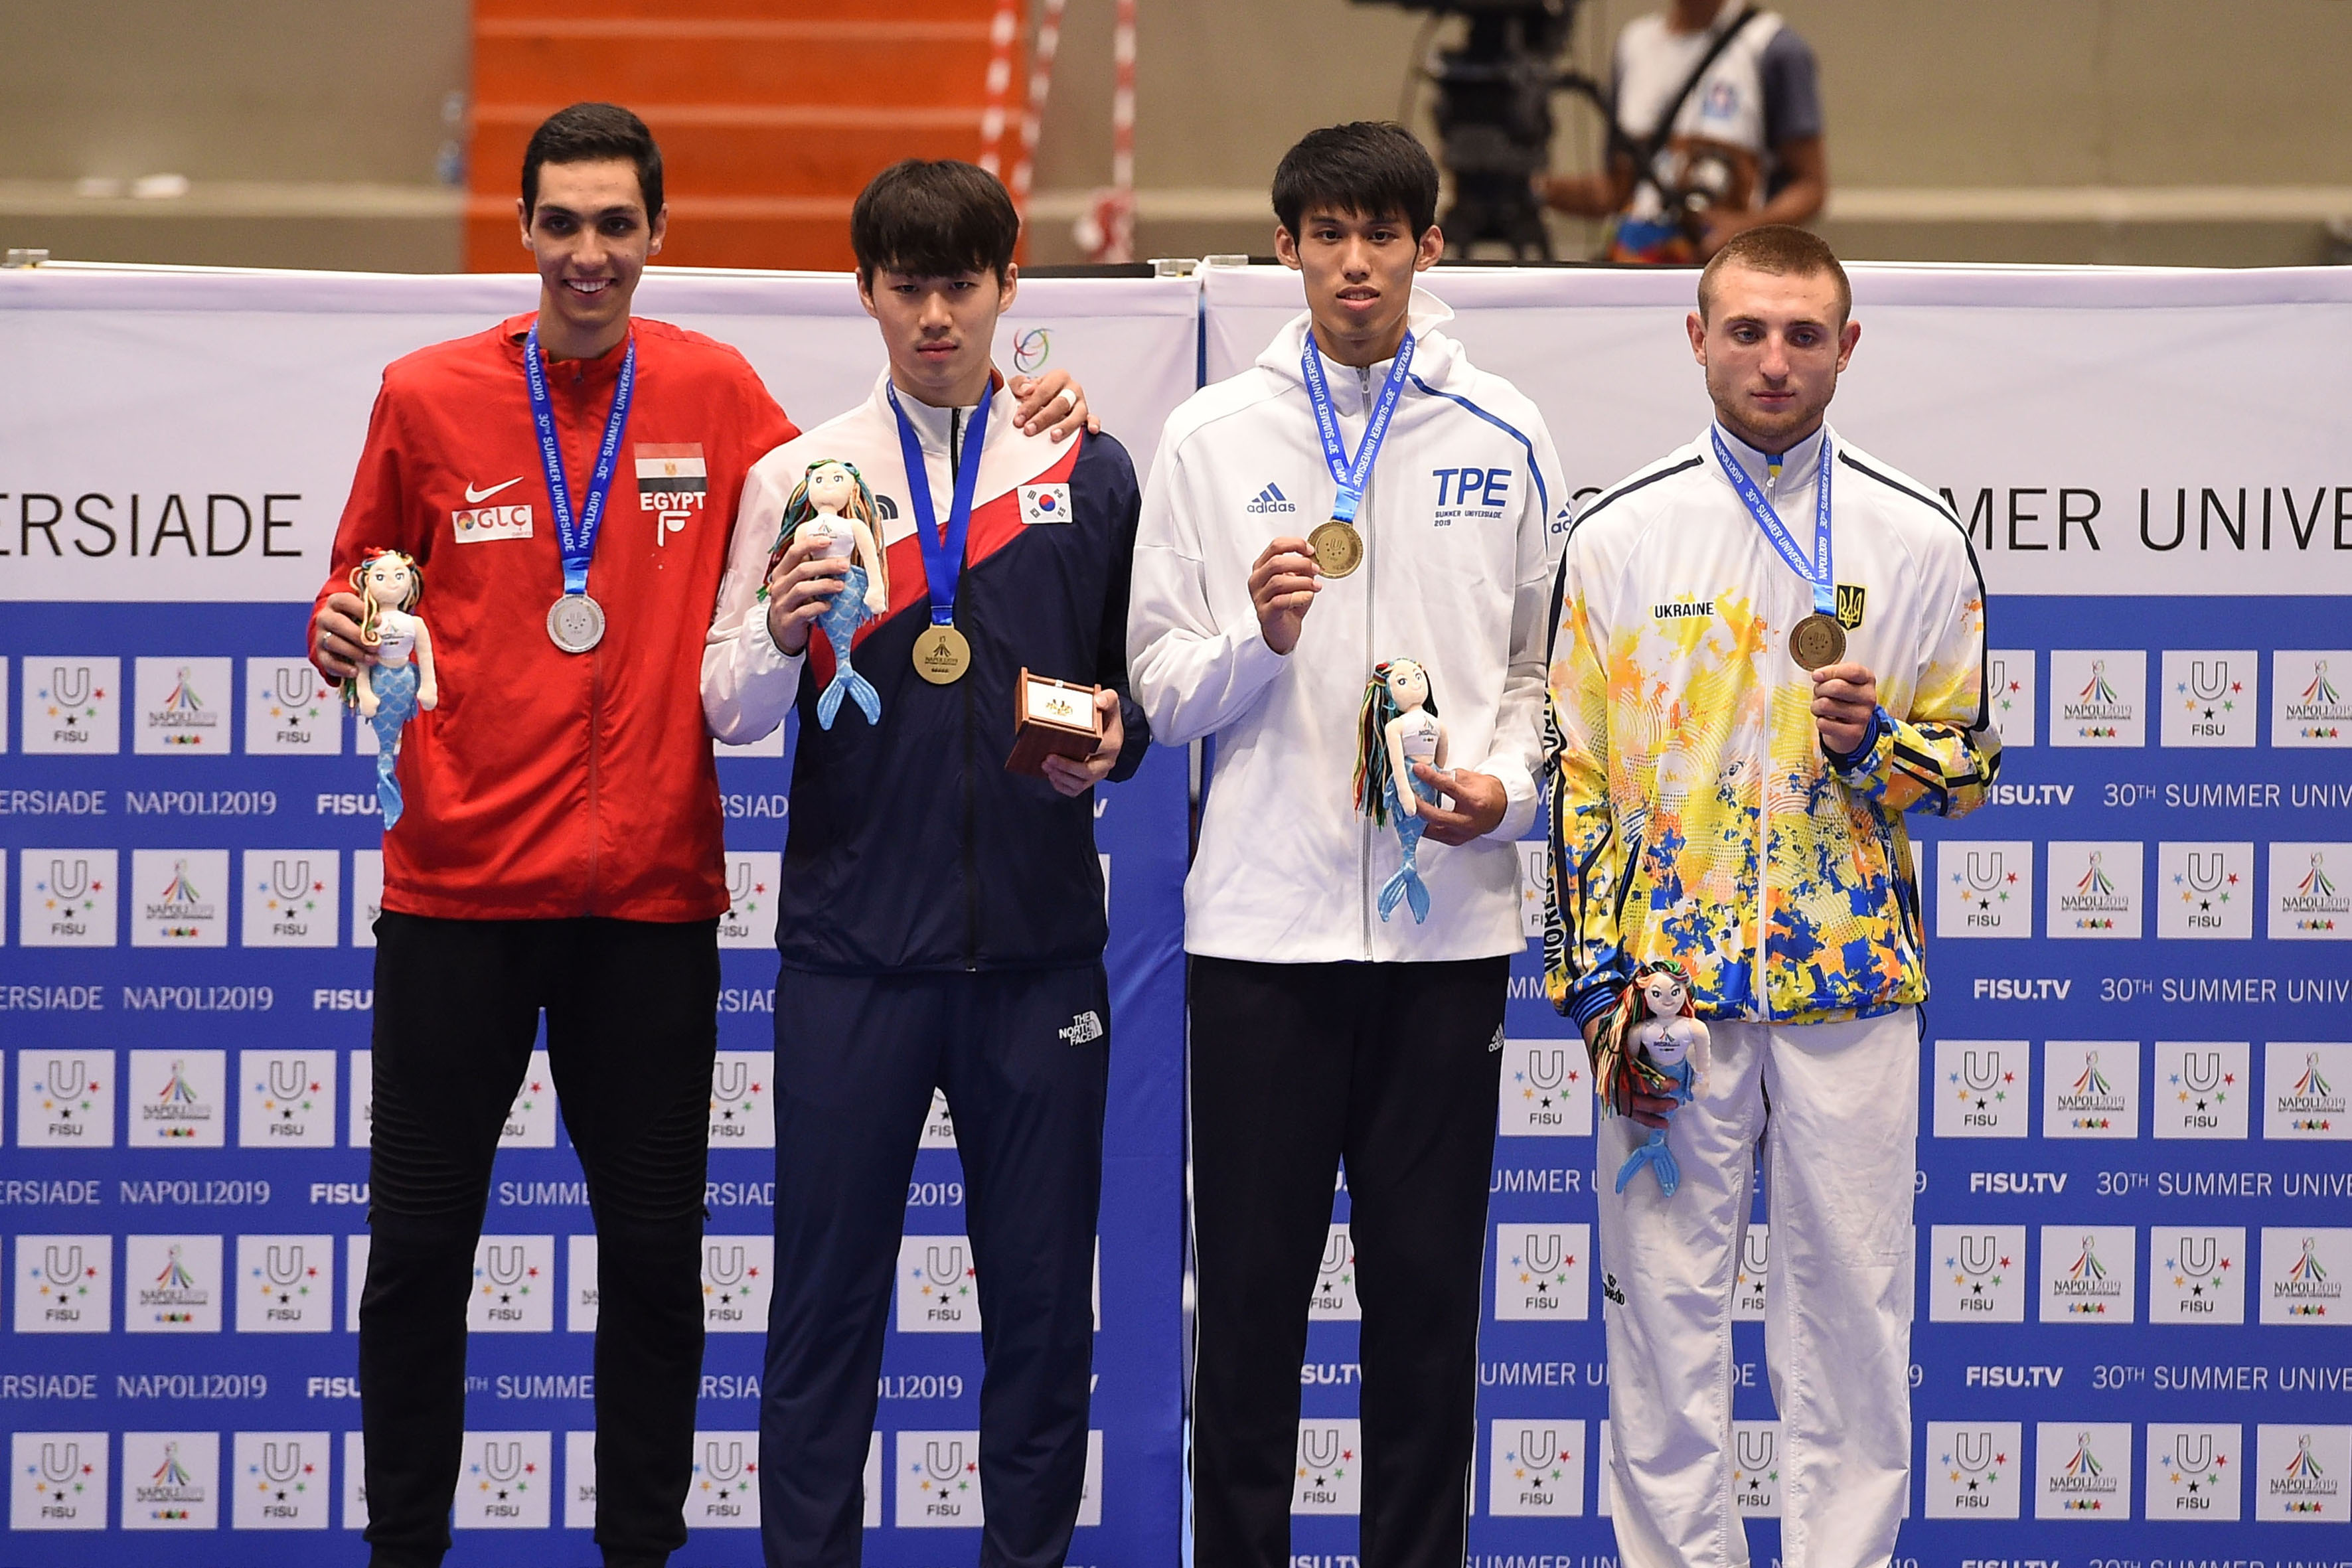 Taekwondo - 09-07-2019 Premiazioni FOTO POOL FOTOGRAFI UNIVERSIADE NAPOLI 2019